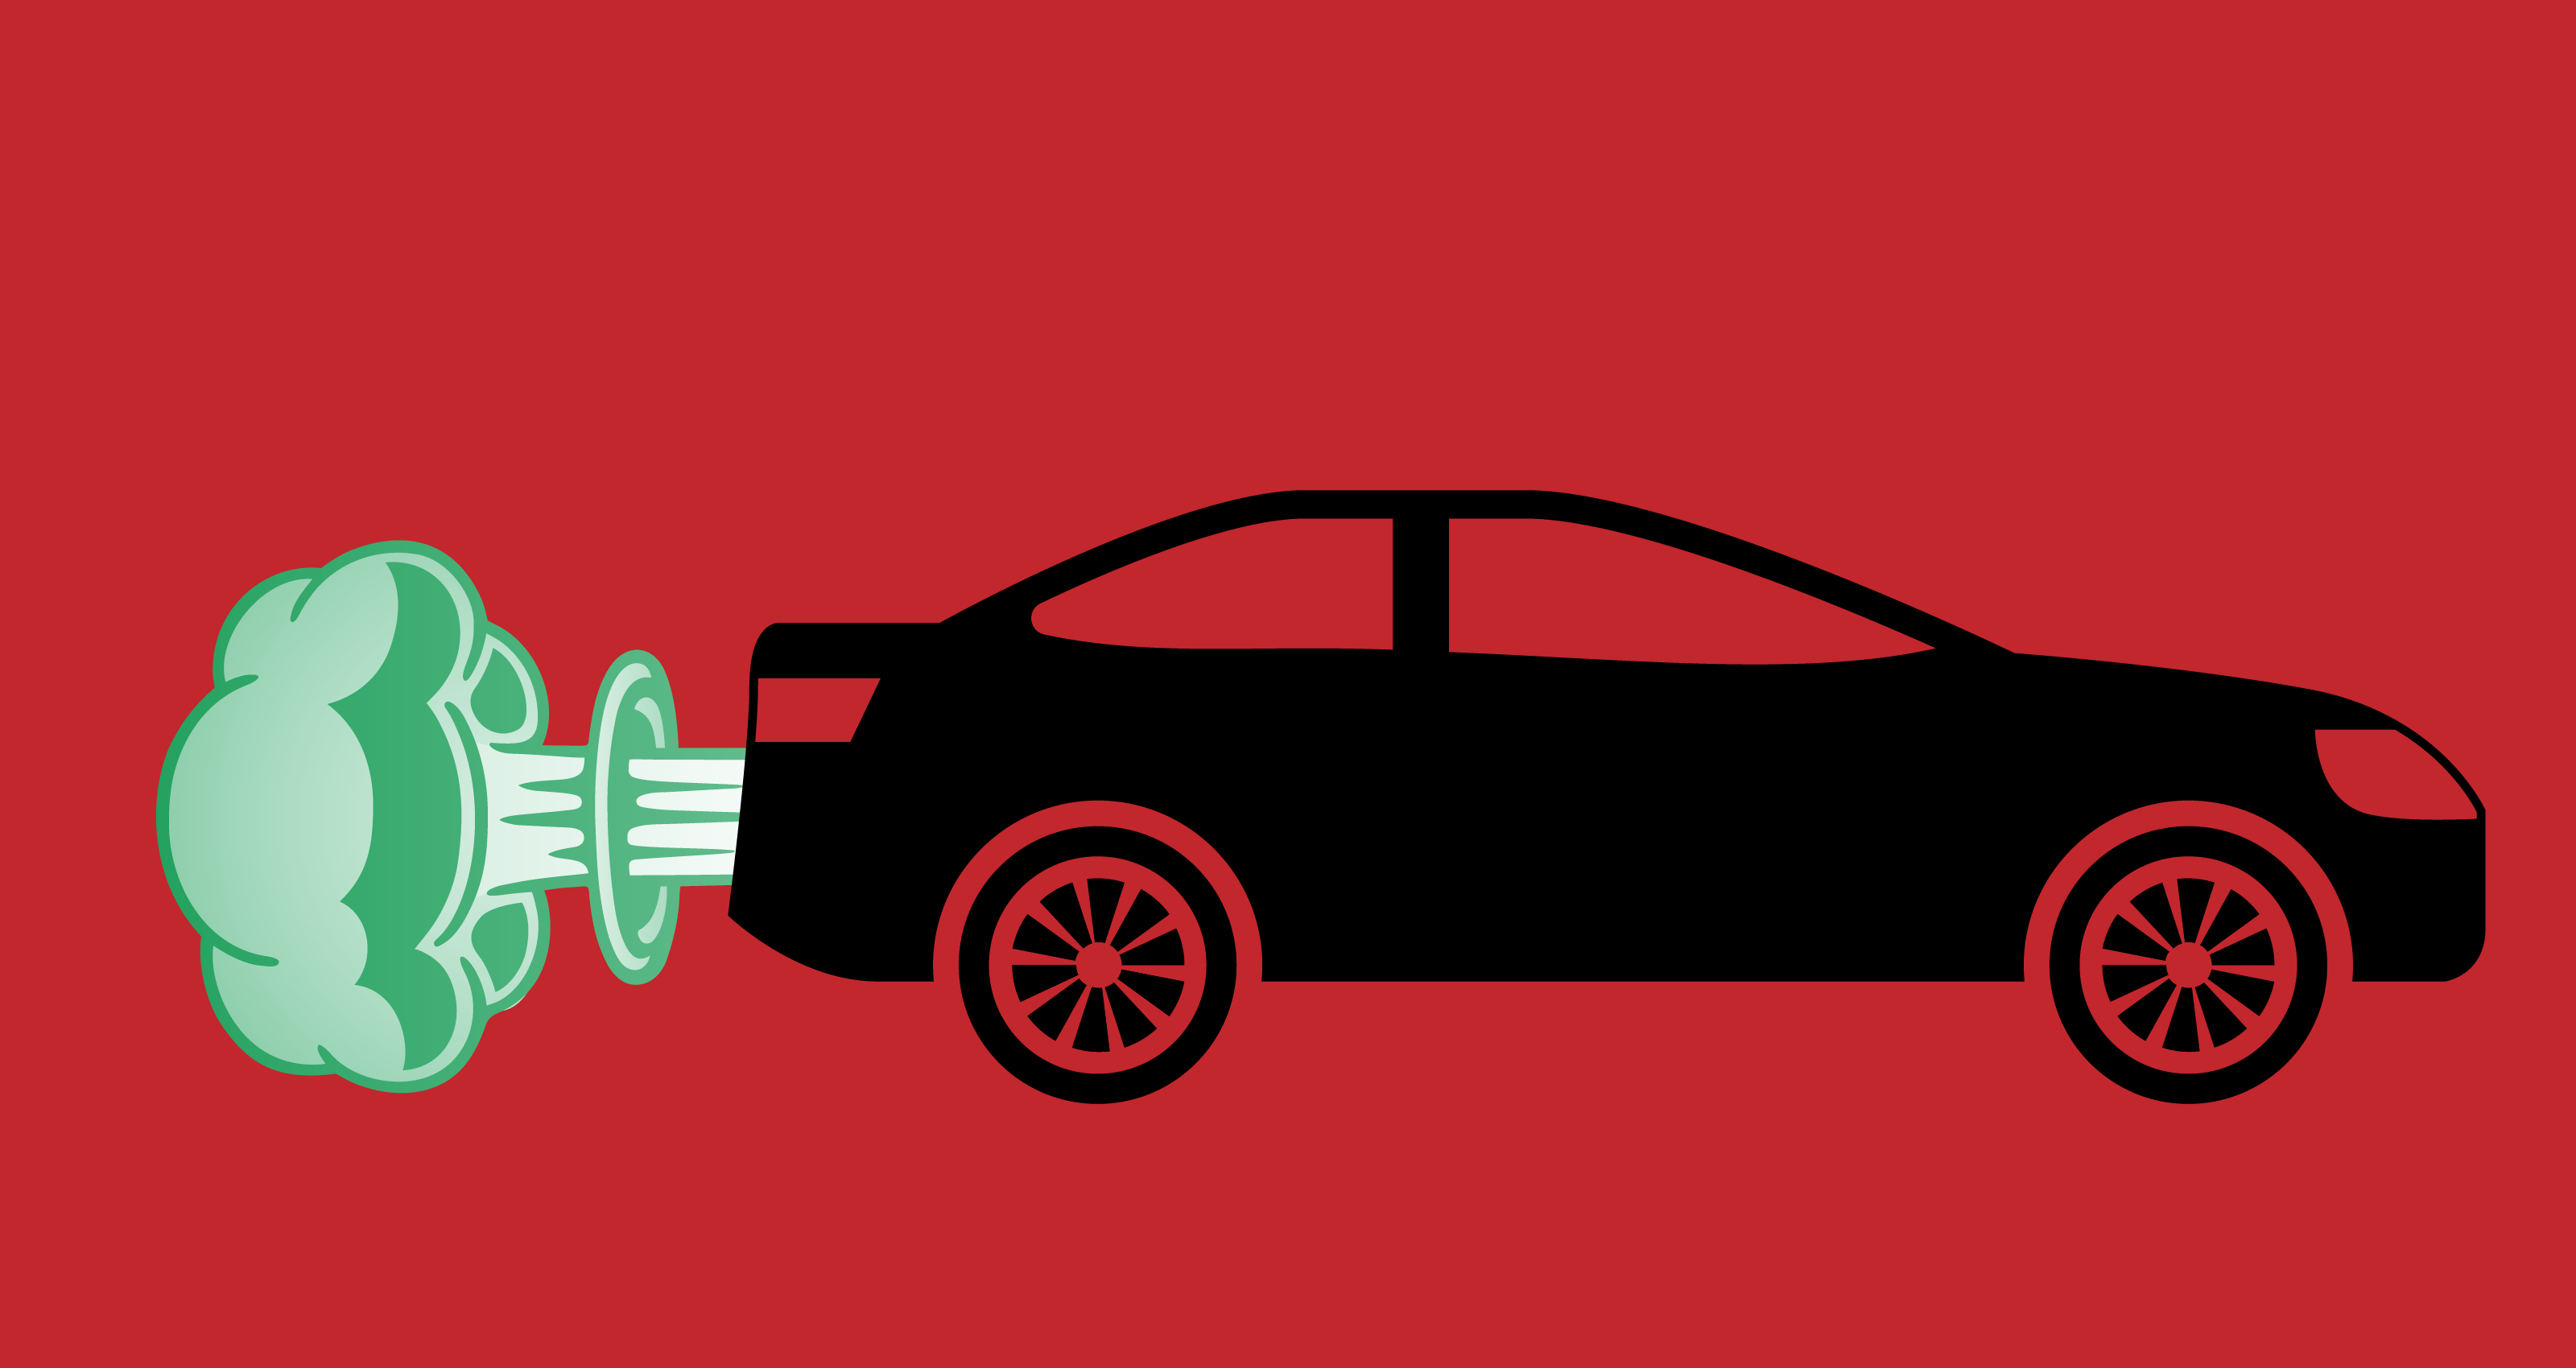 Стивен Кинг о режиме пердежа в Tesla: «весьма нелепо… хотя в то же время и забавно»